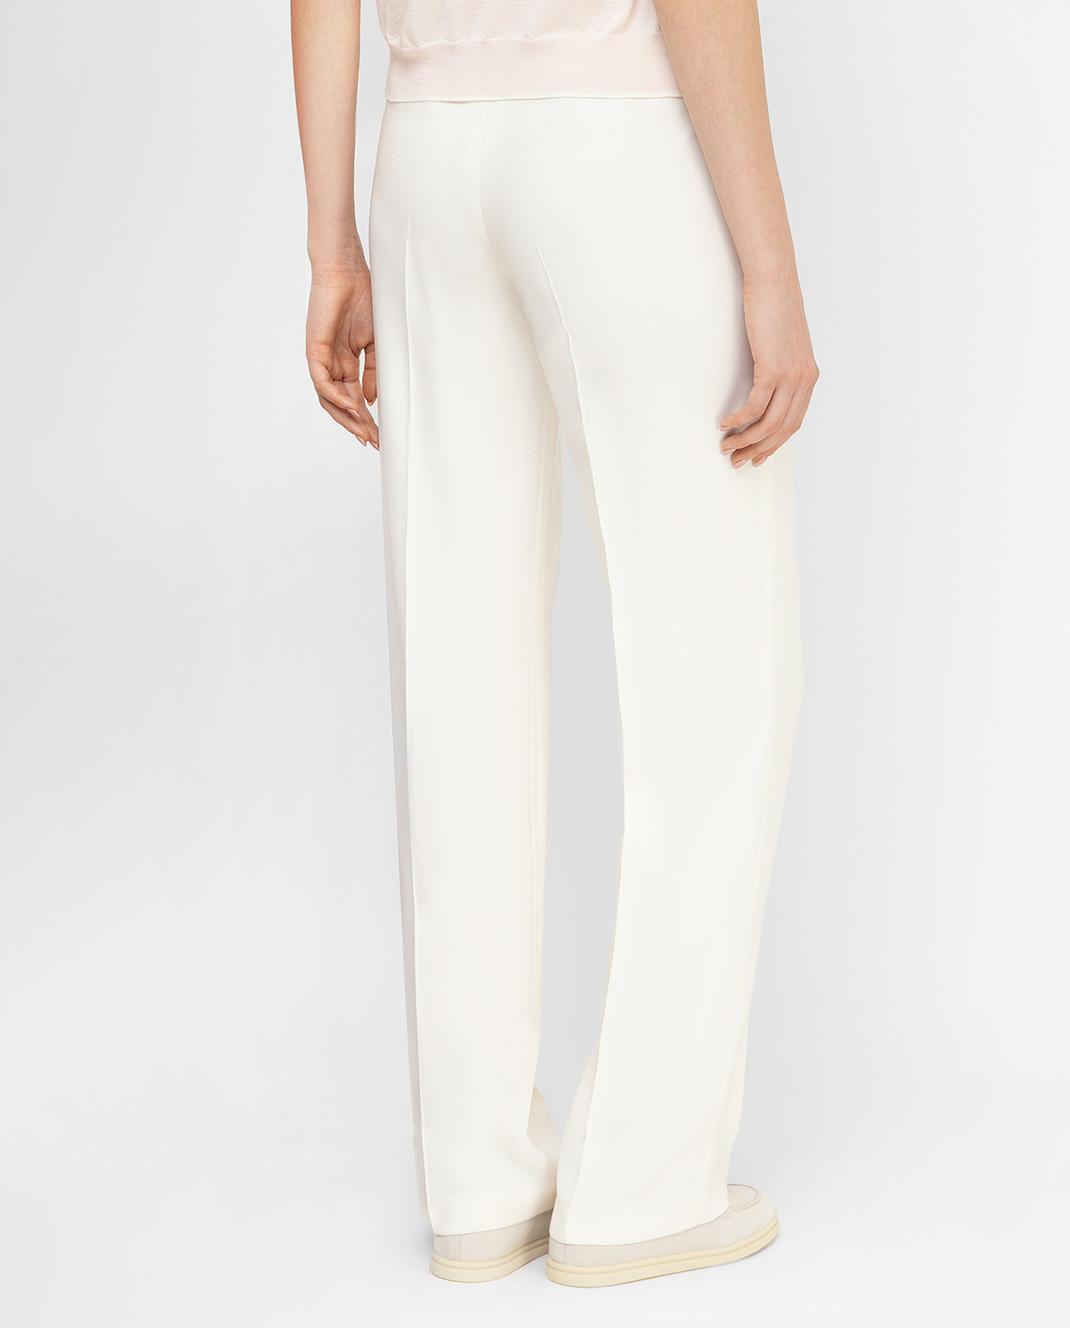 Loro Piana Светло-бежевые брюки из шелка и шерсти F1FAI5226 изображение 4